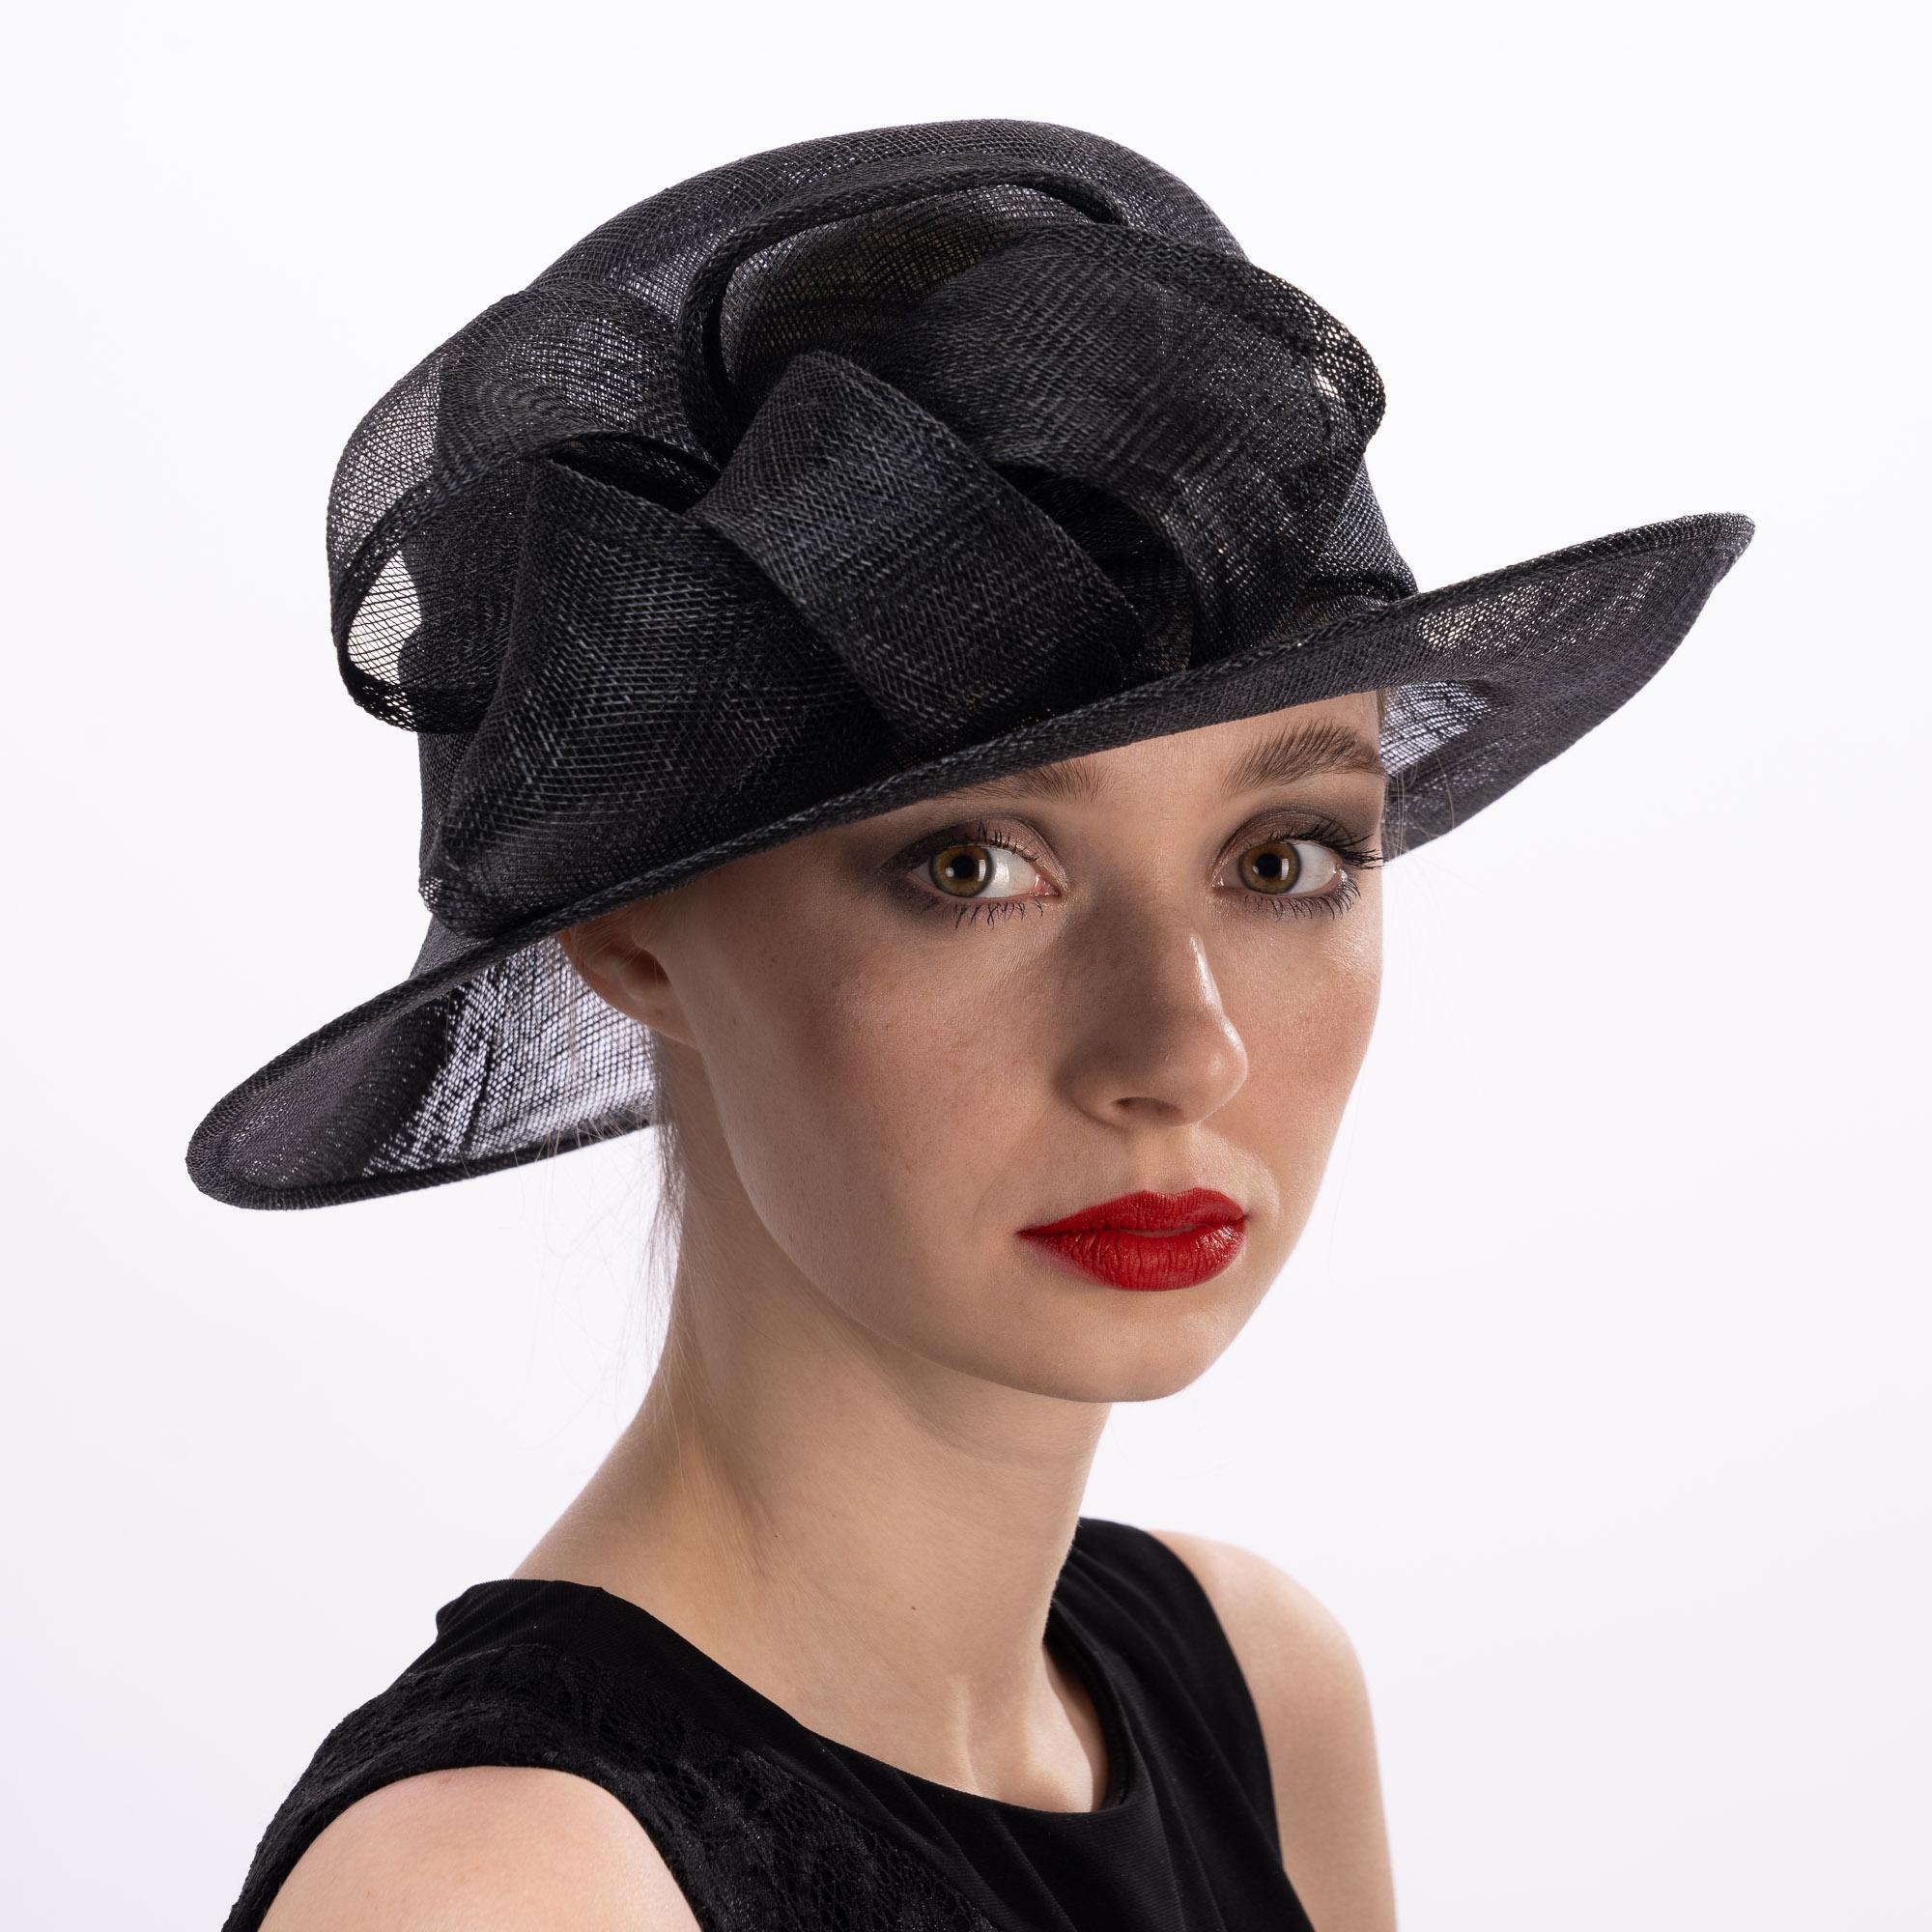 Black Short Brim Sidesweep Sinamay Dress Formal Hat